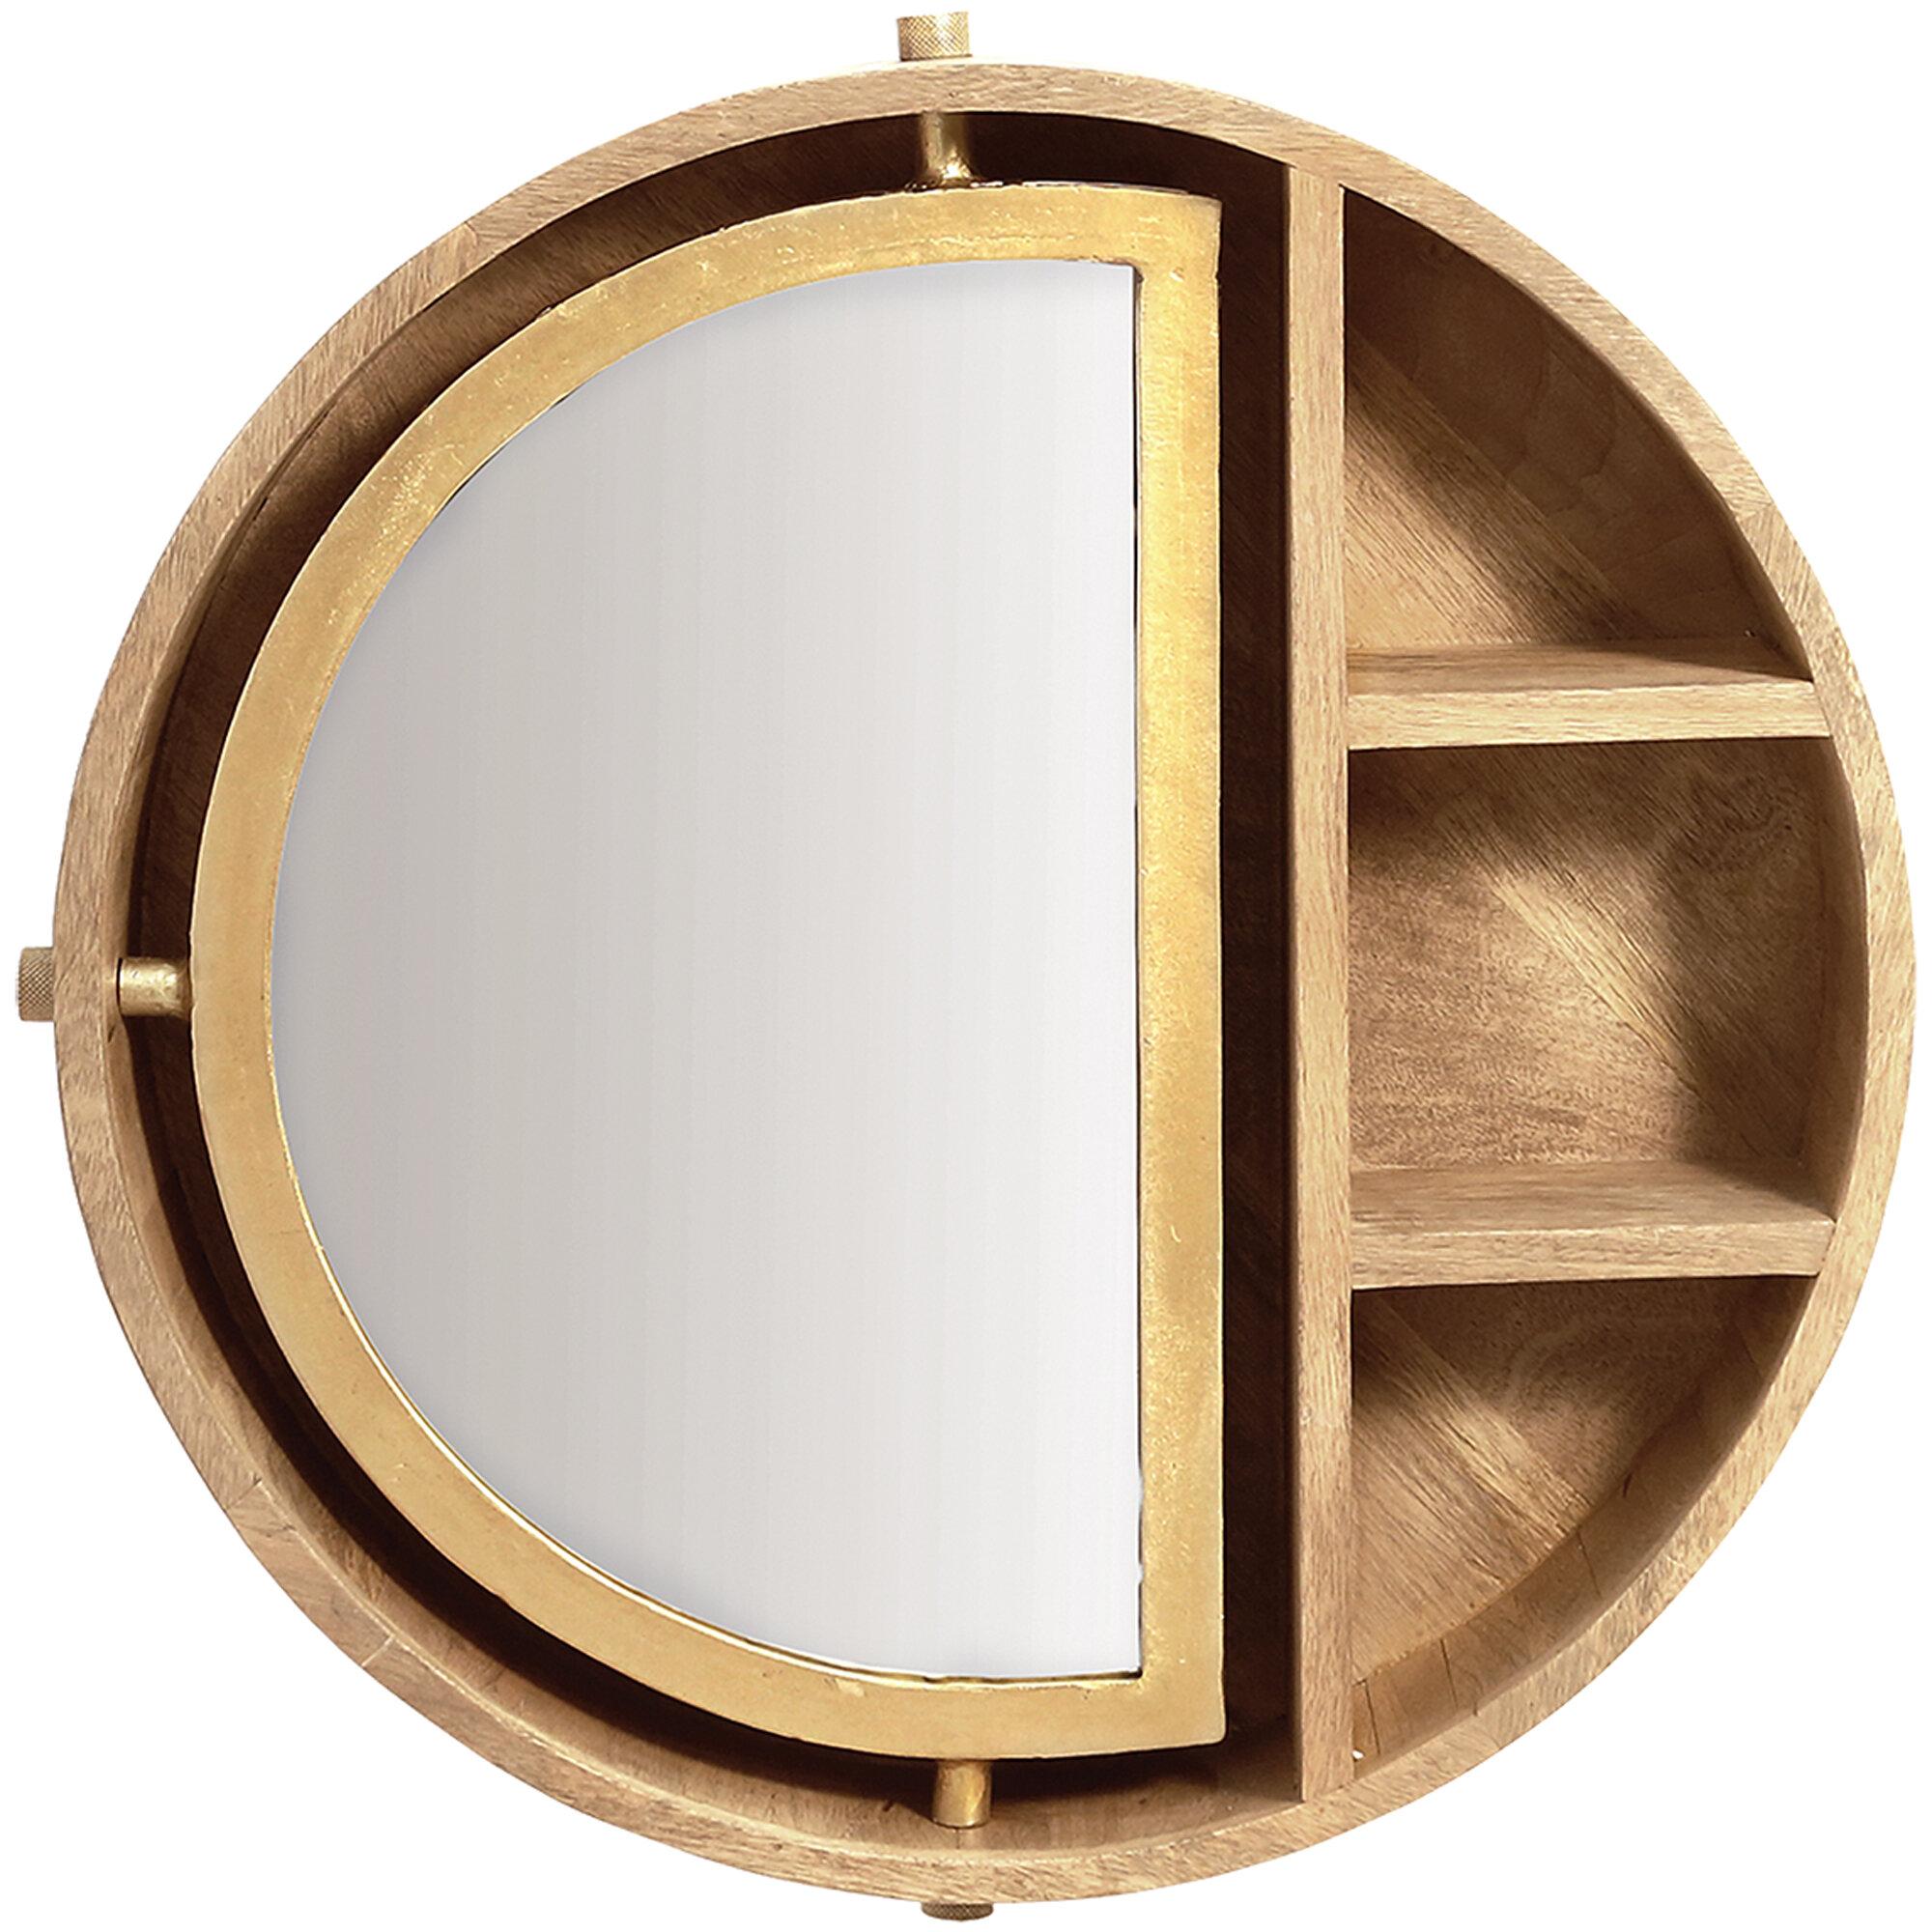 Light Wood Shelves Mirrors You Ll Love In 2021 Wayfair